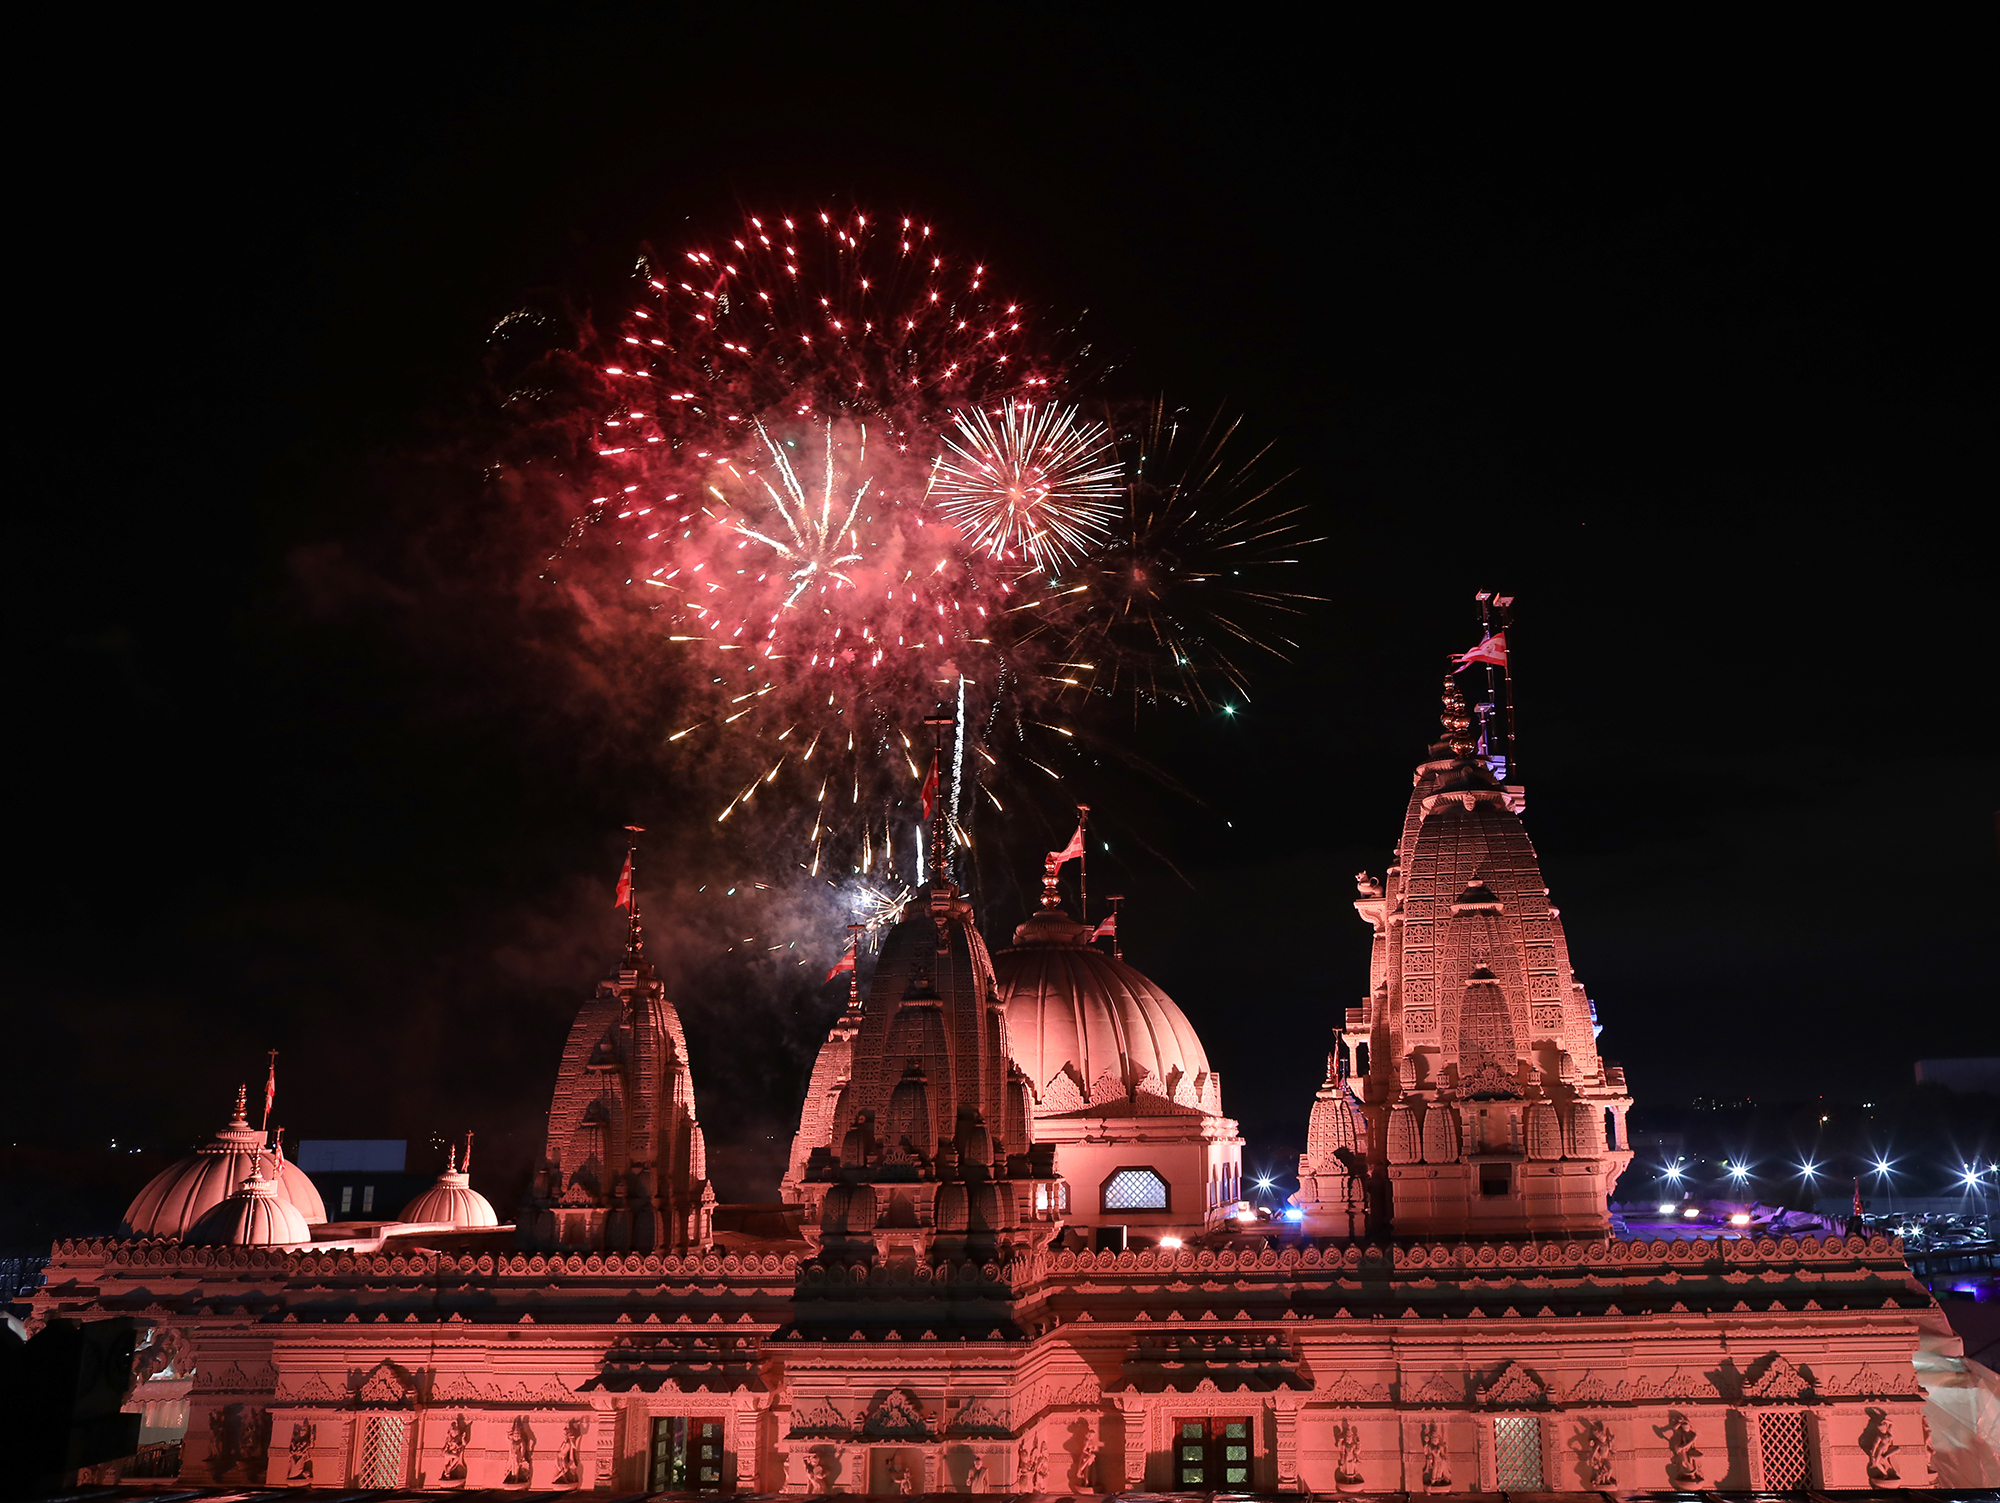 181107_london_diwali-fireworks_12